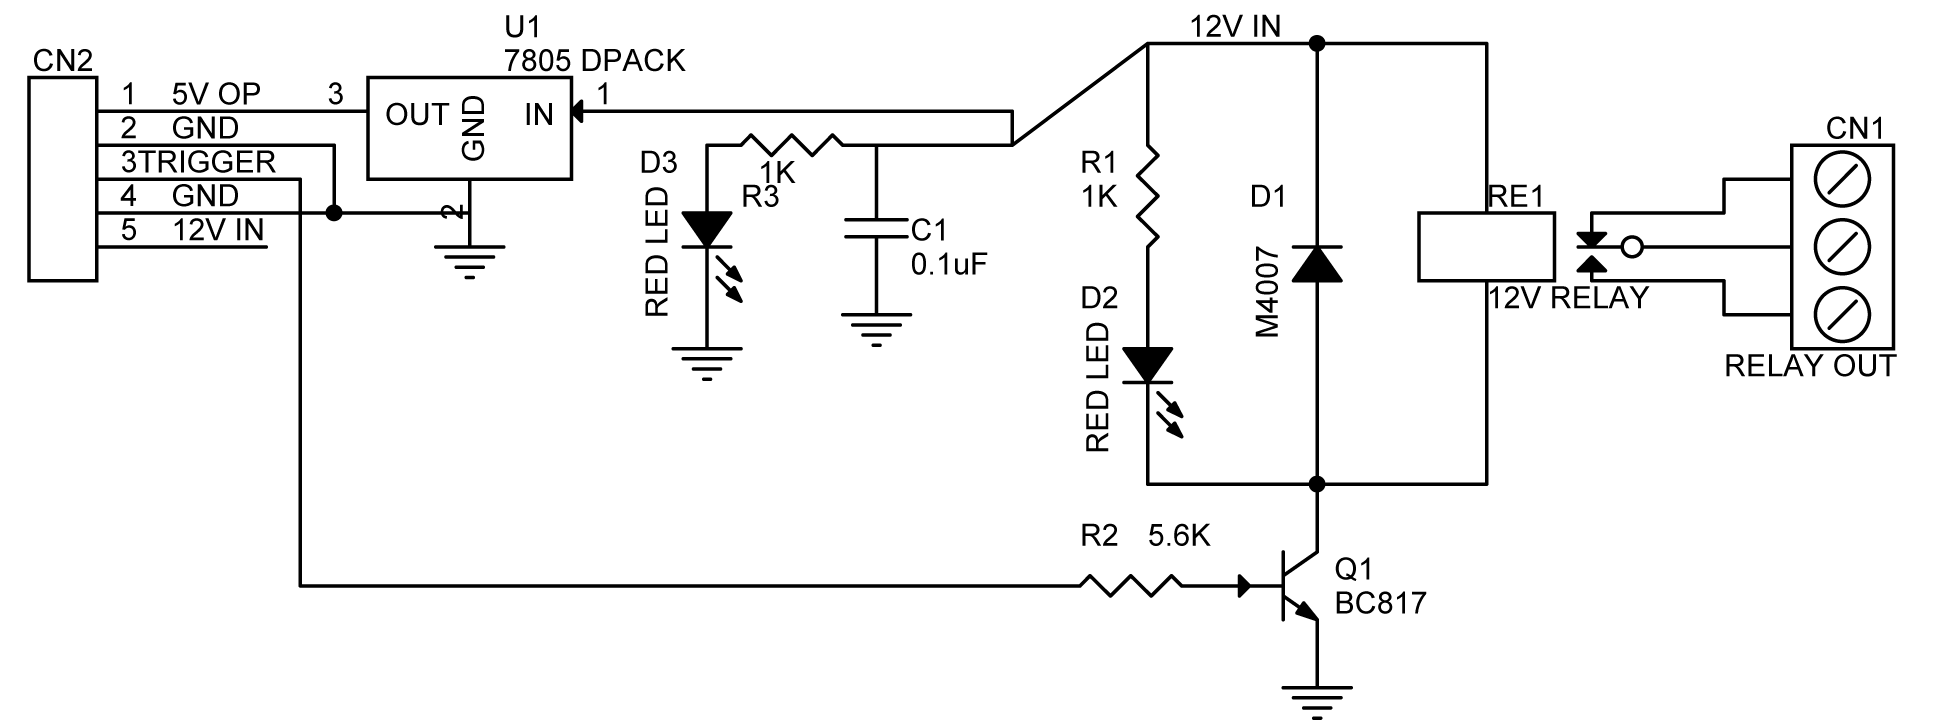 hight resolution of relay board wiring diagrams wiring database library rh 18 arteciock de 8 pin relay wiring diagram cube relay wiring diagram